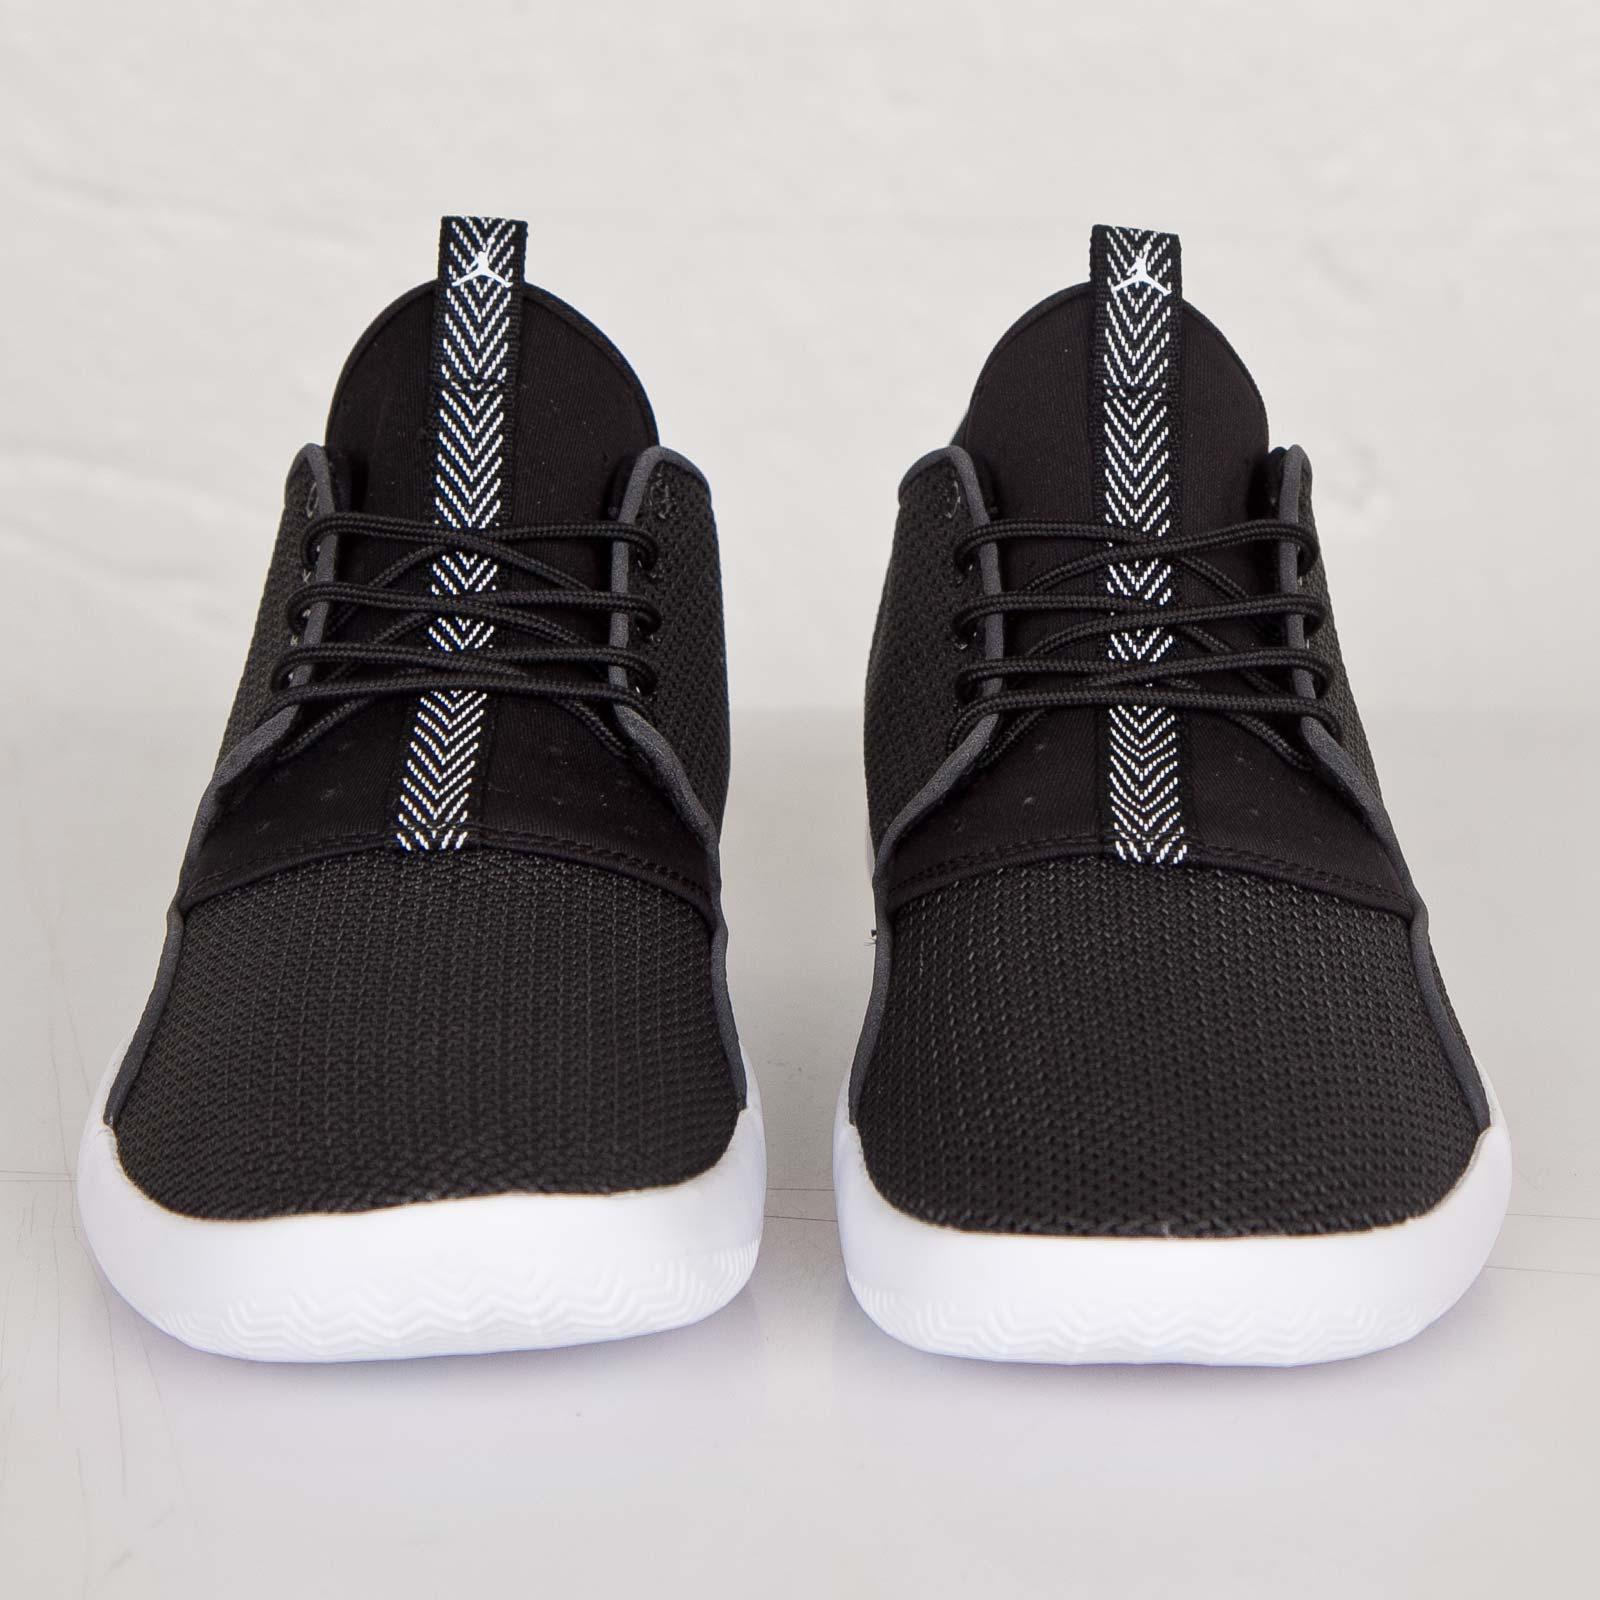 new style 10ffa 8038e order nike air jordan eclipse mens shoes 724010 012 black platinum sz 10  ebay d3c0d 4ee0f  low price brand jordan jordan eclipse brand jordan jordan  eclipse ...